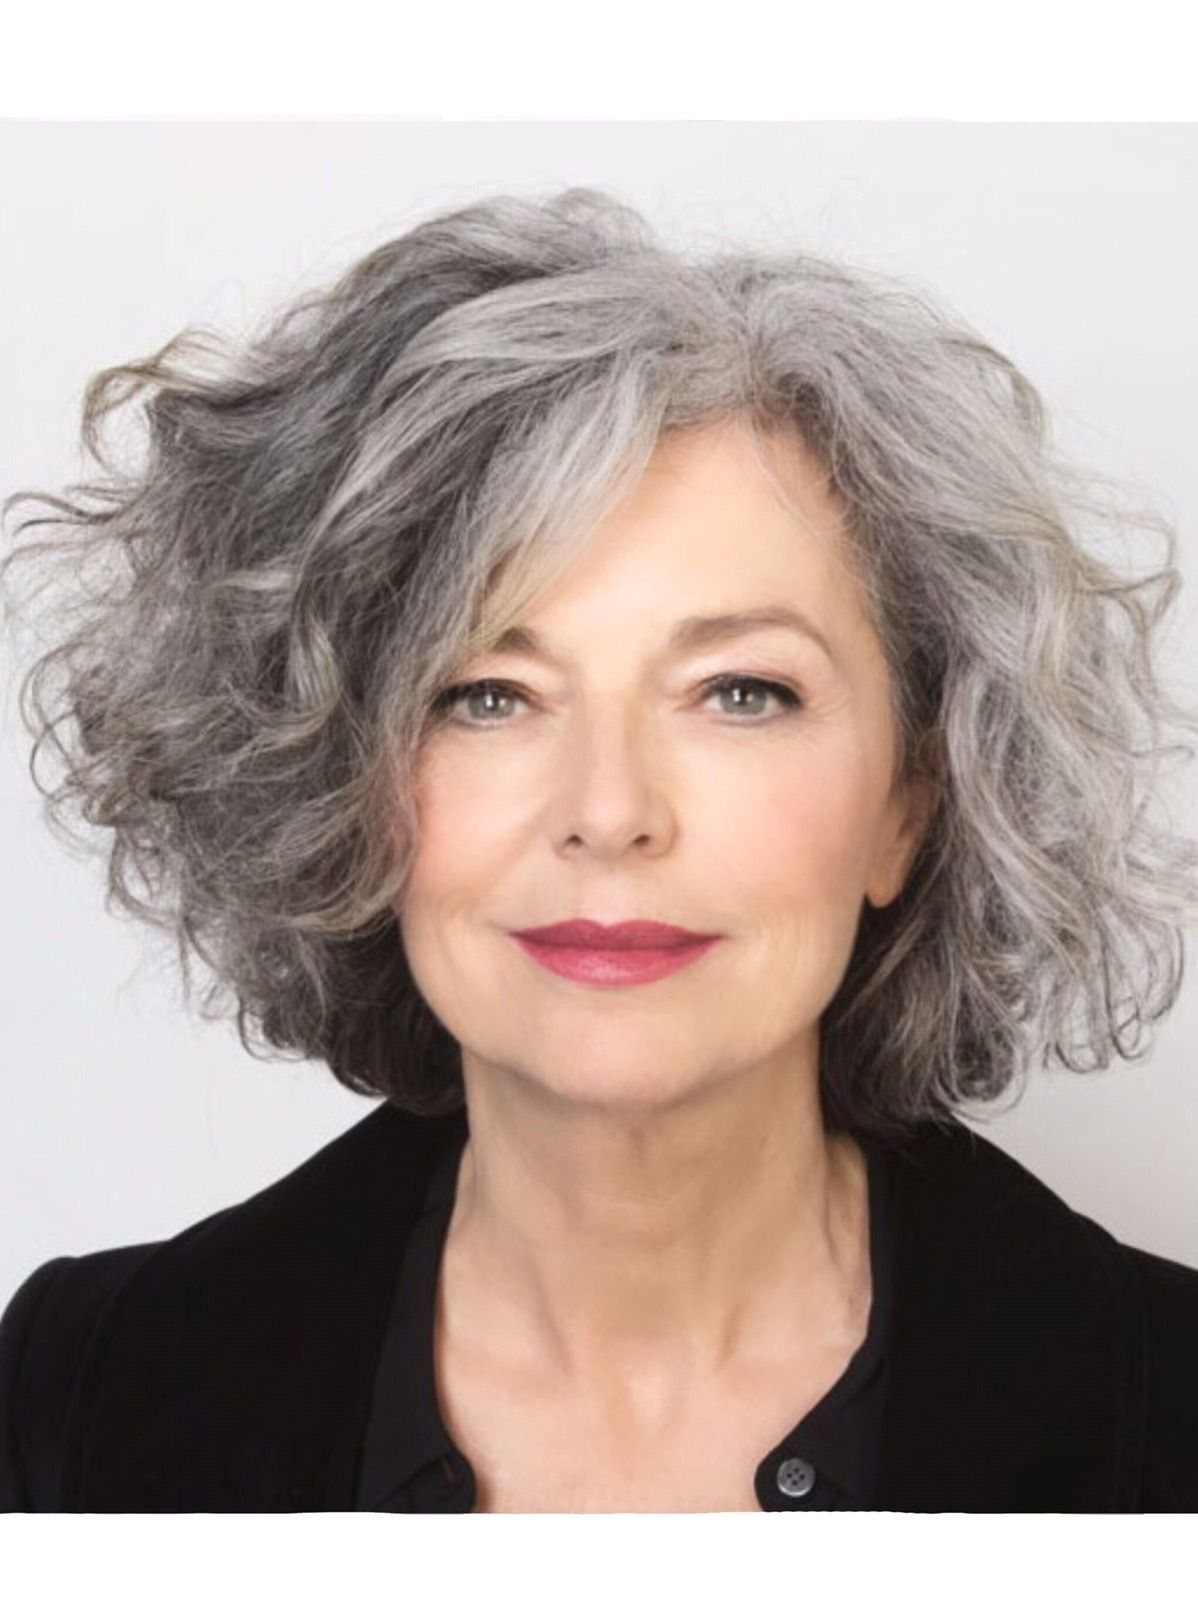 Salt And Pepper Gray Hair Grey Hair Silver Hair White Hair Don T Care No Dye Dye Free Natural Highlights Aging An Grijs Haar Grijs Haar Kapsels Kapsels